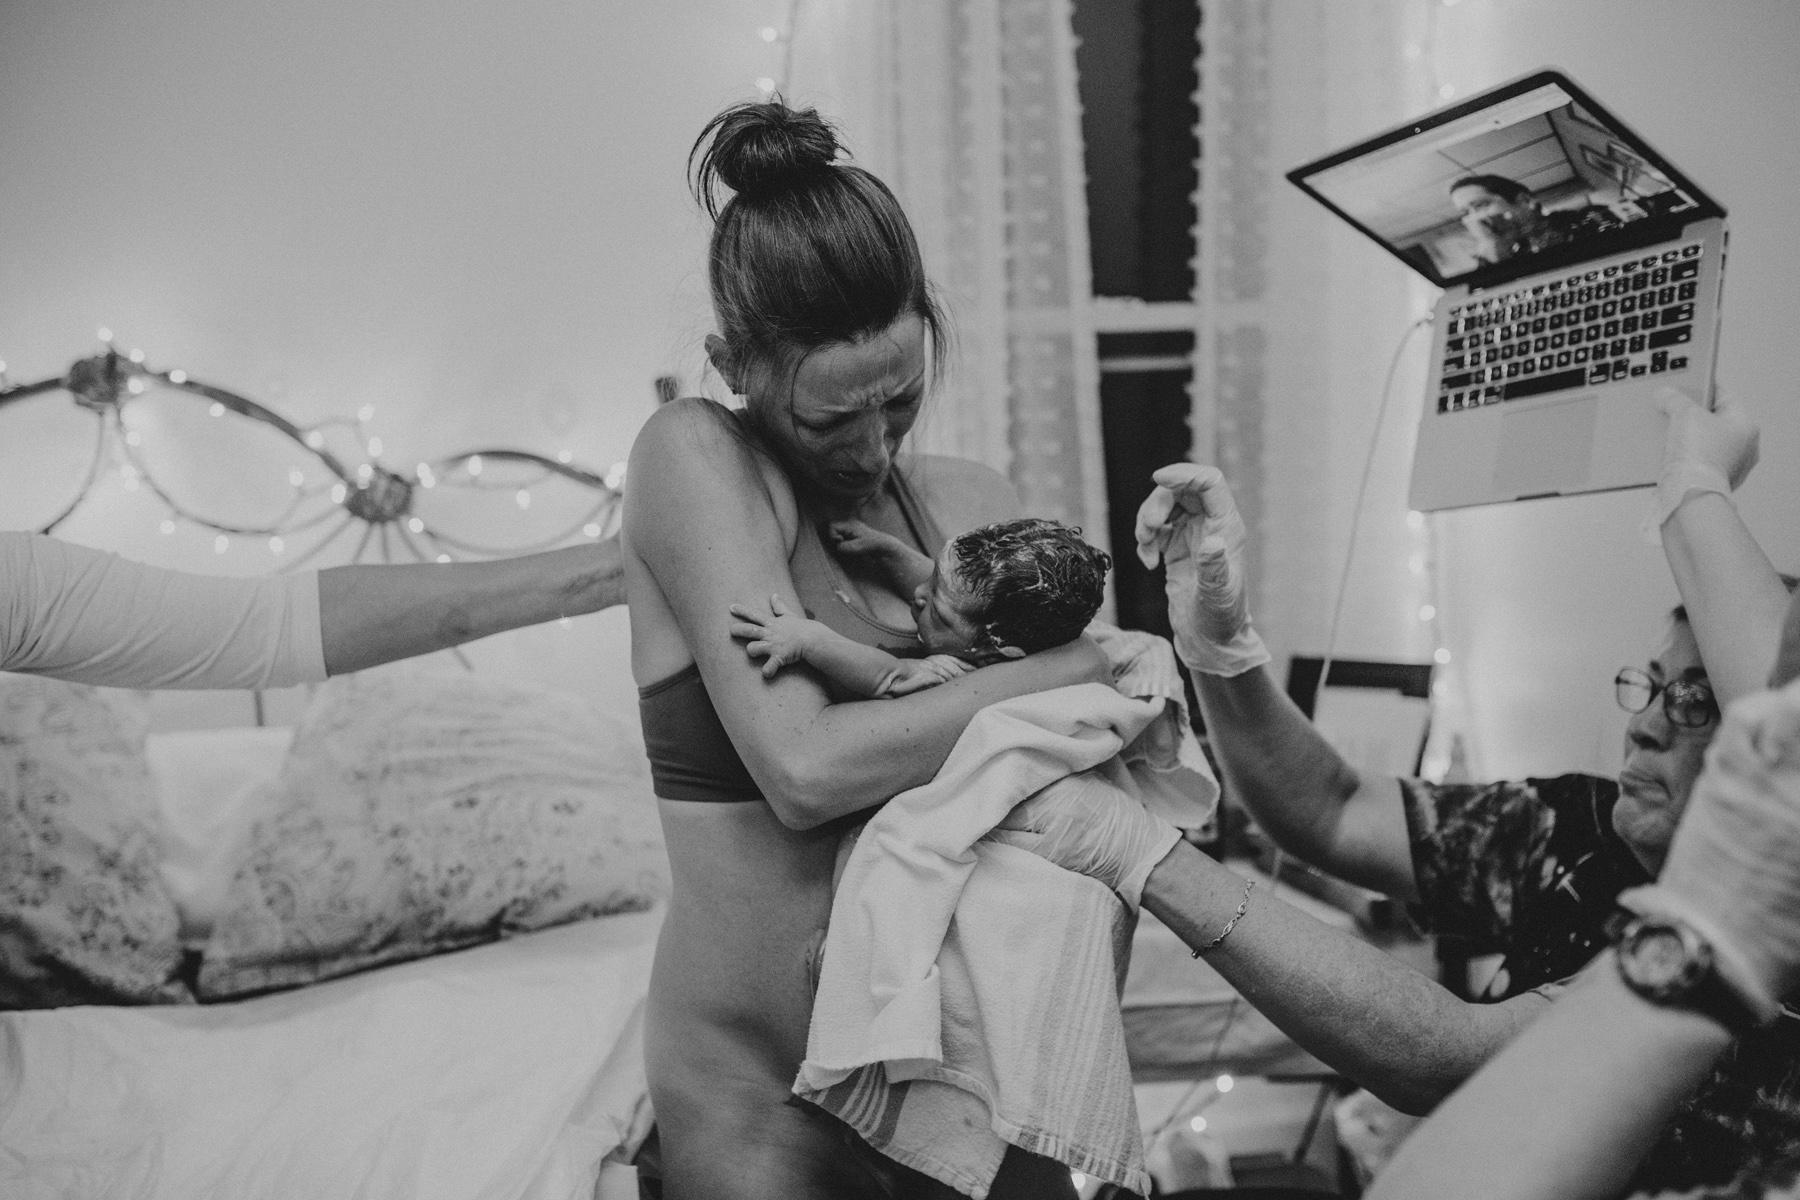 albany_birth_photographer_017.jpg